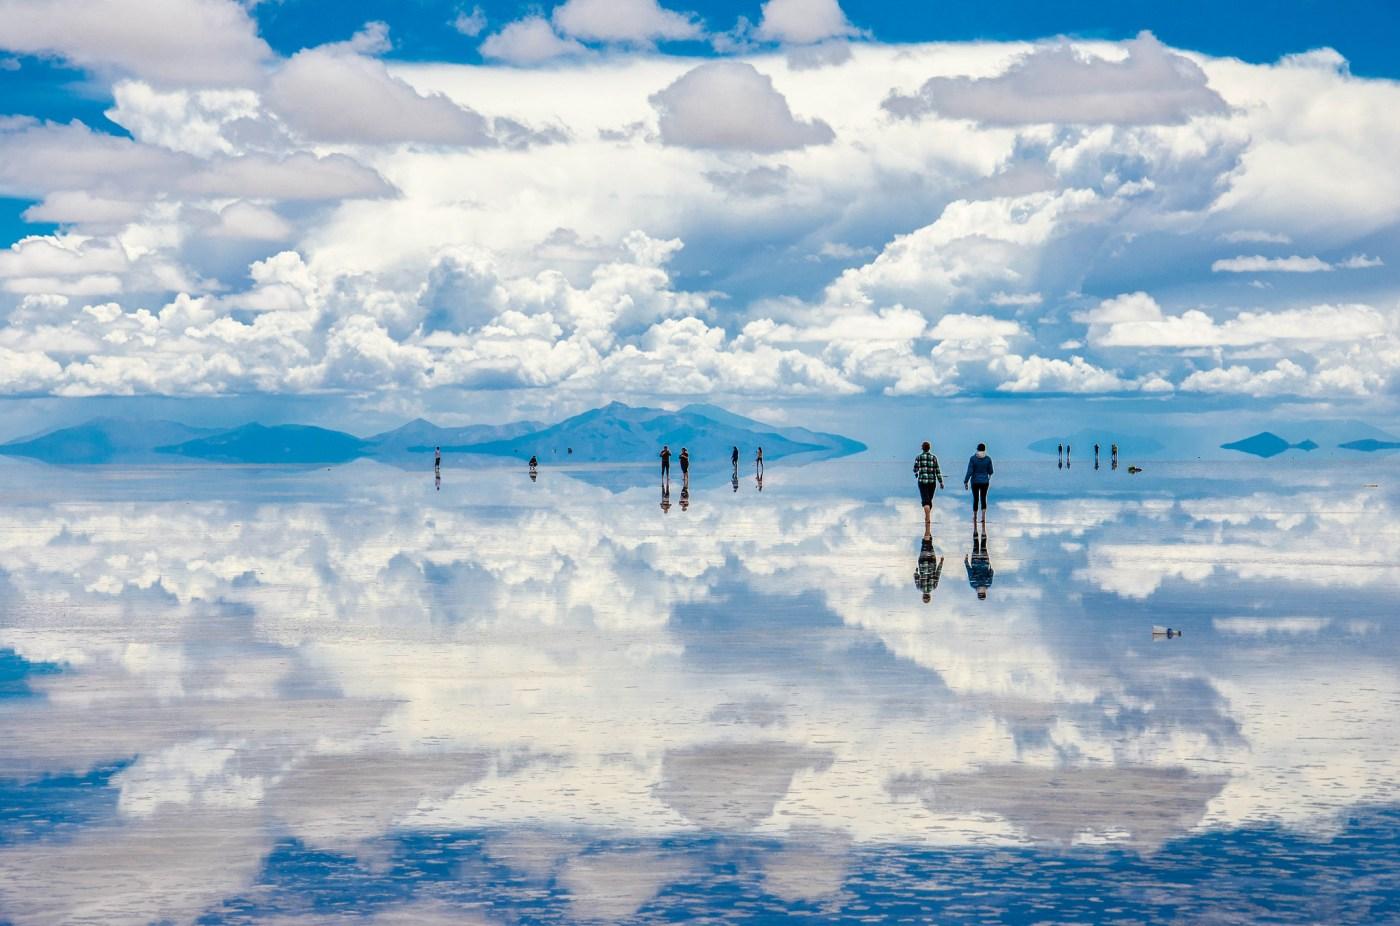 Dicas do Salar de Uyuni - Deserto de Sal na Bolívia